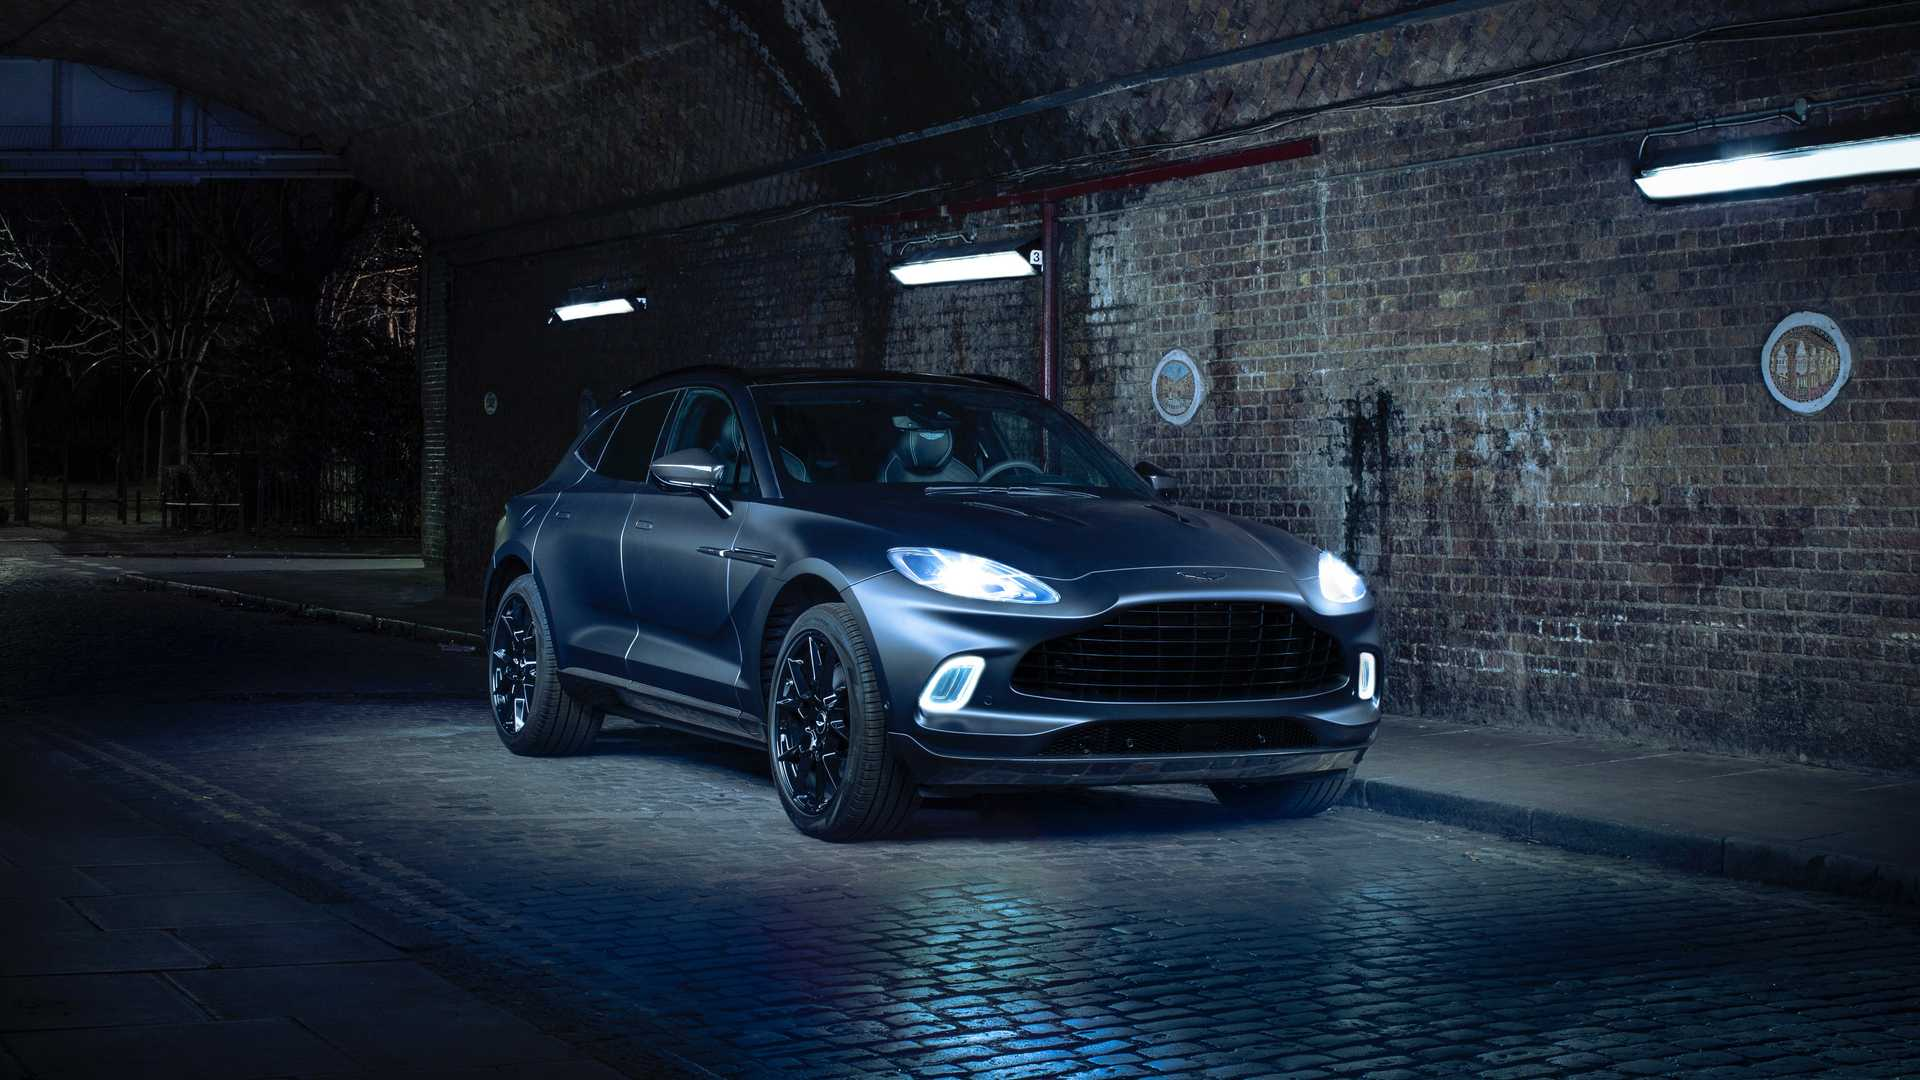 Aston Martin DBX Q en las calles nocturnas